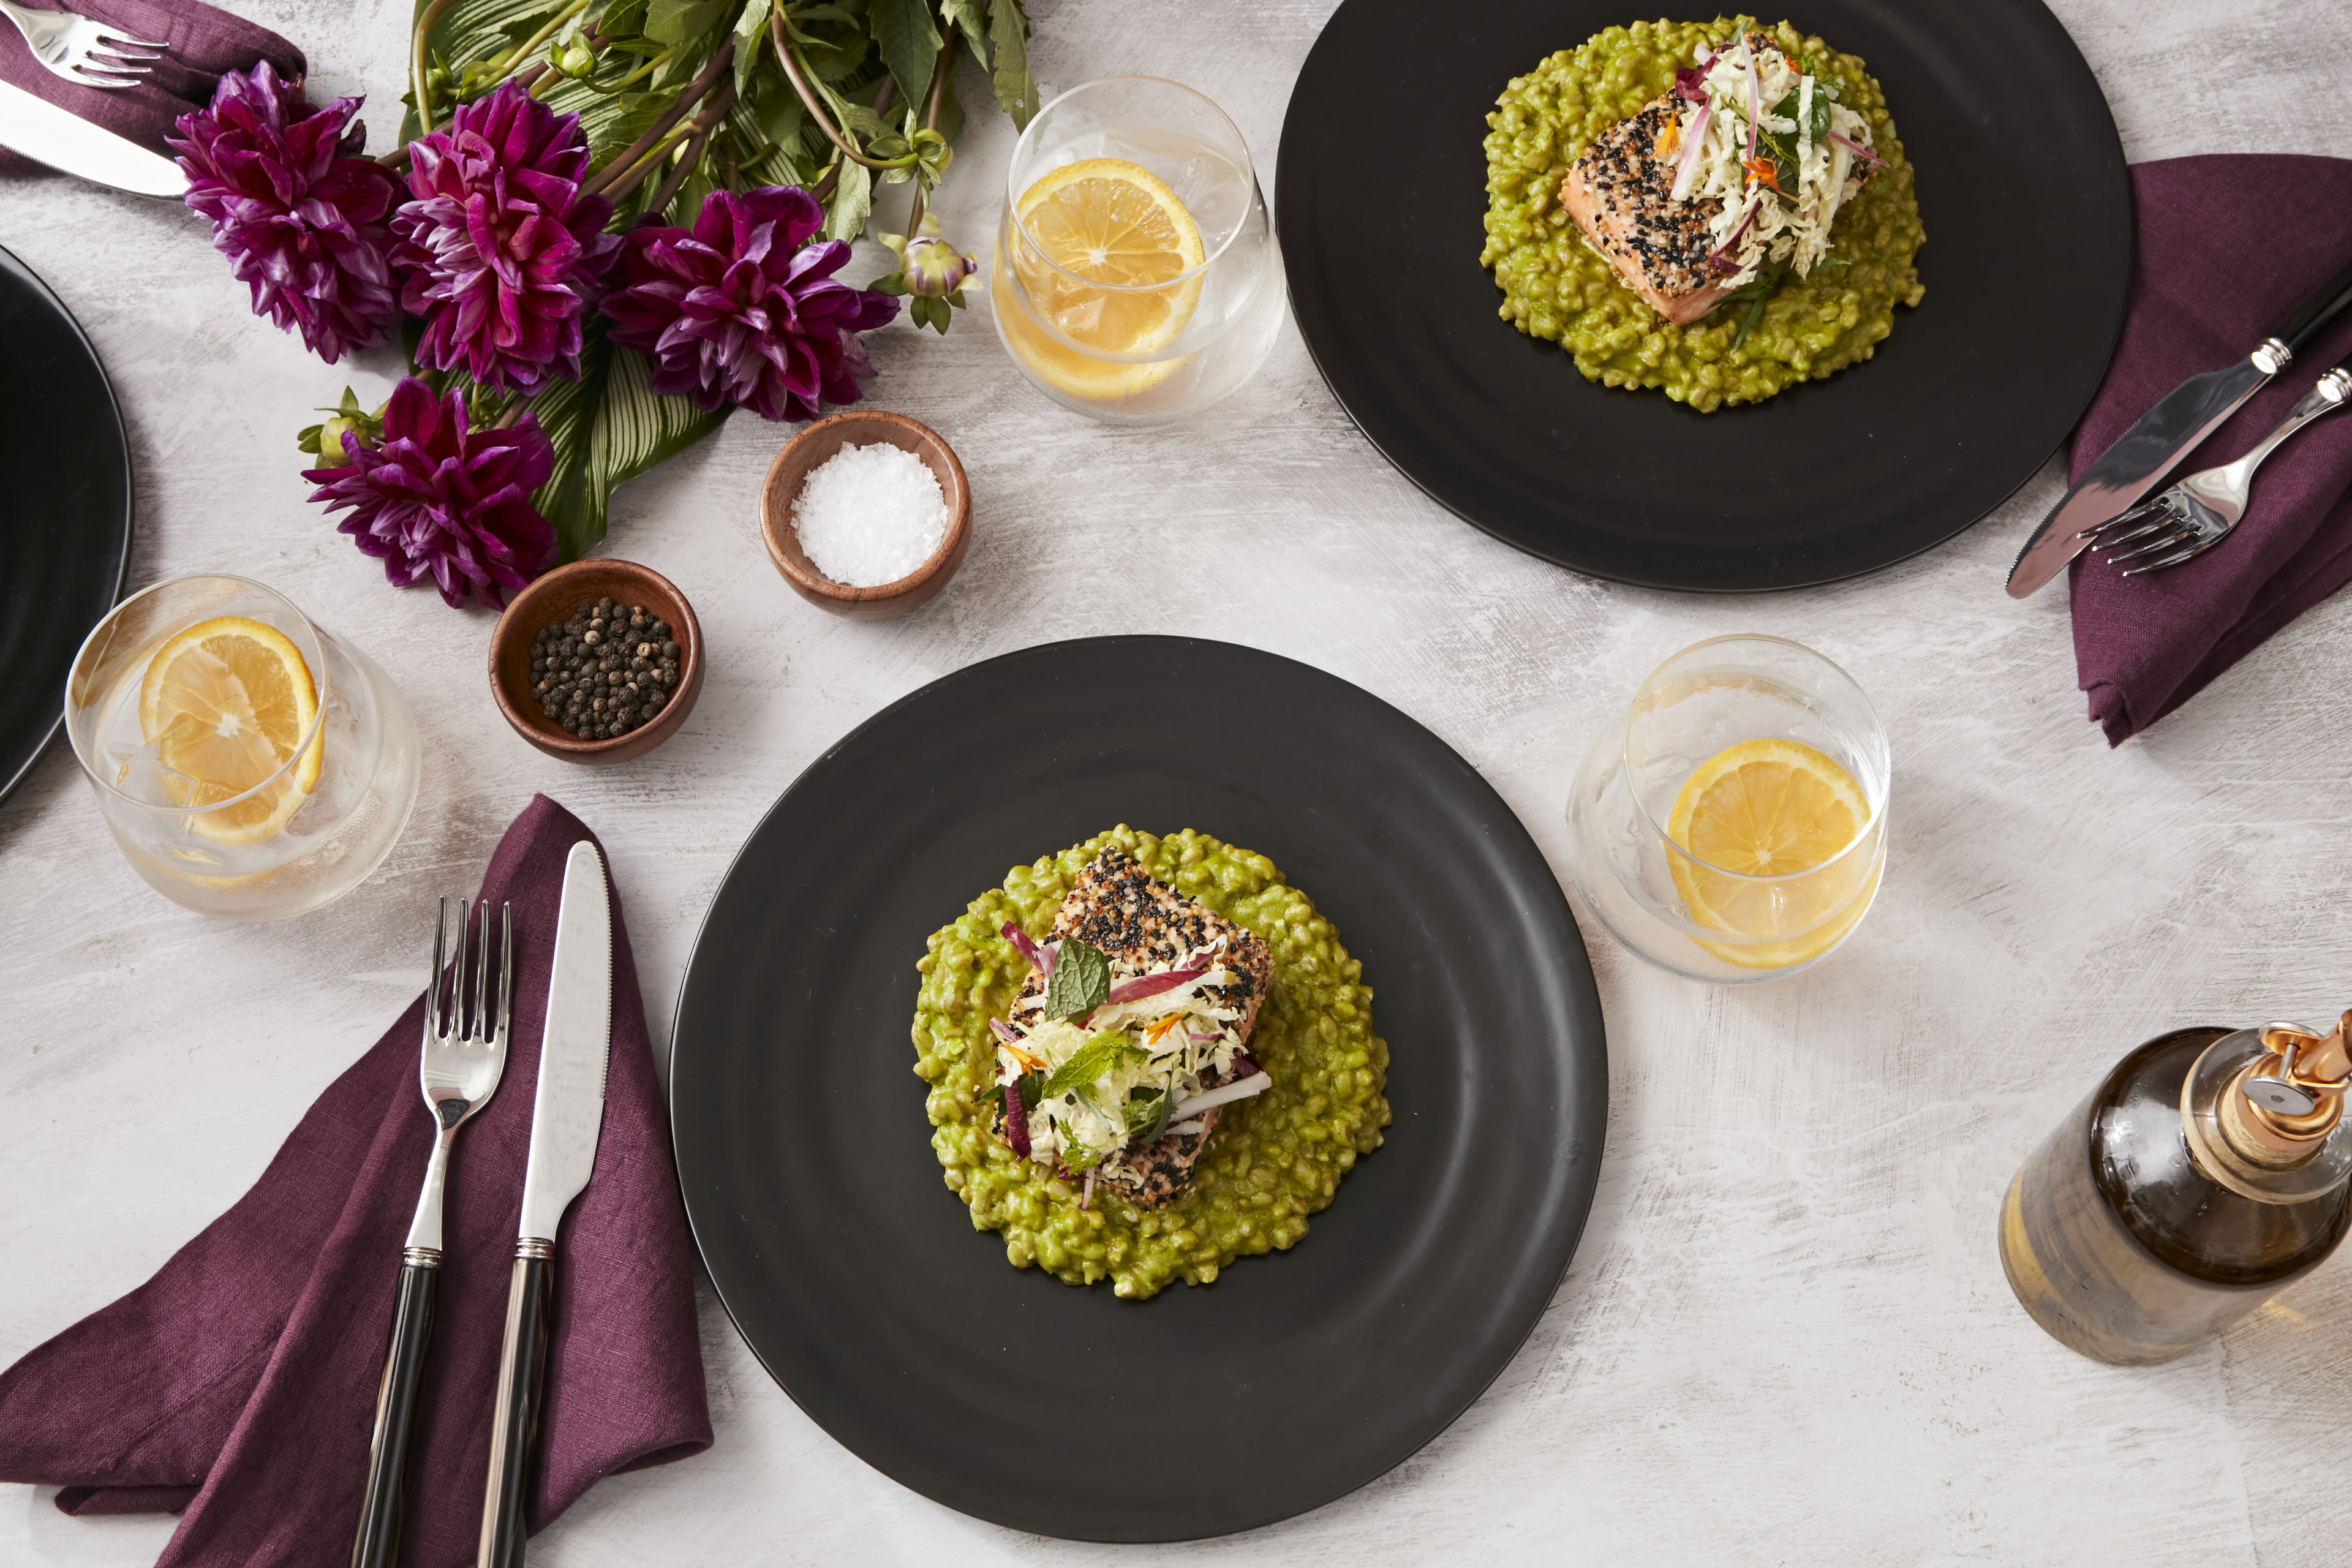 Main Dish - Seed-Crusted Arctic Char, Farro Risotto